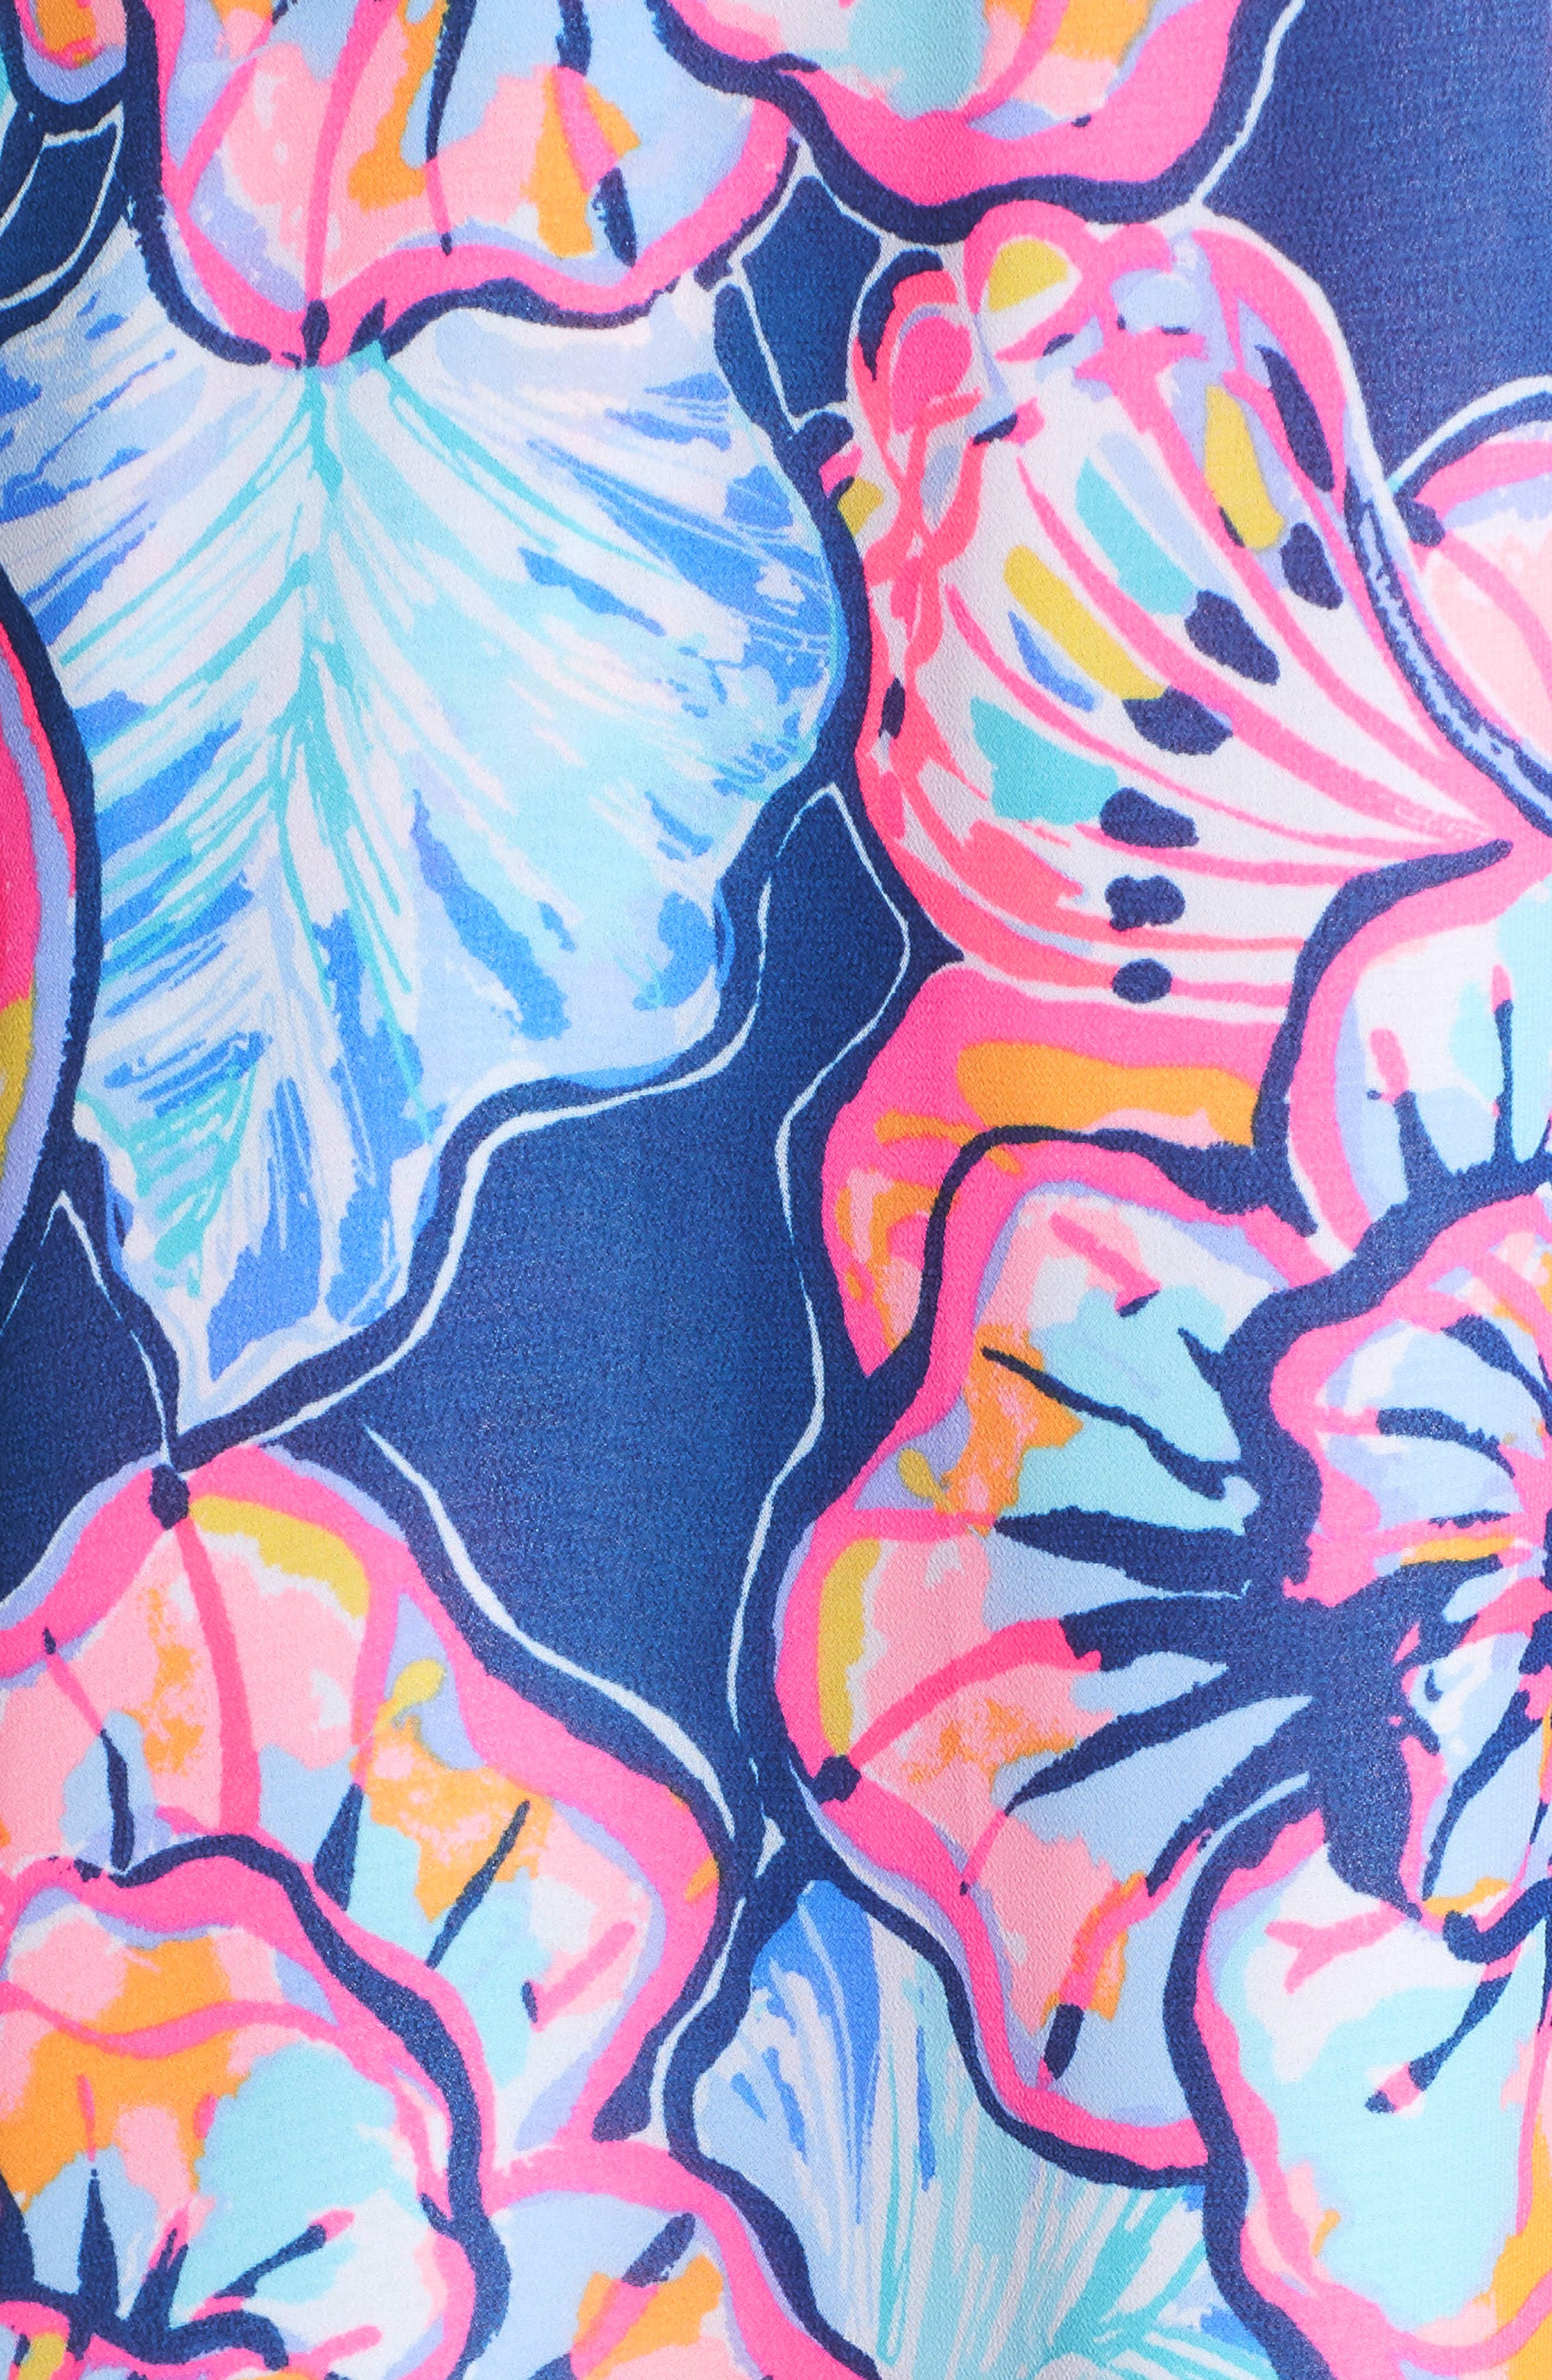 Marianna Asymmetric Midi Wrap Dress,                             Alternate thumbnail 6, color,                             475